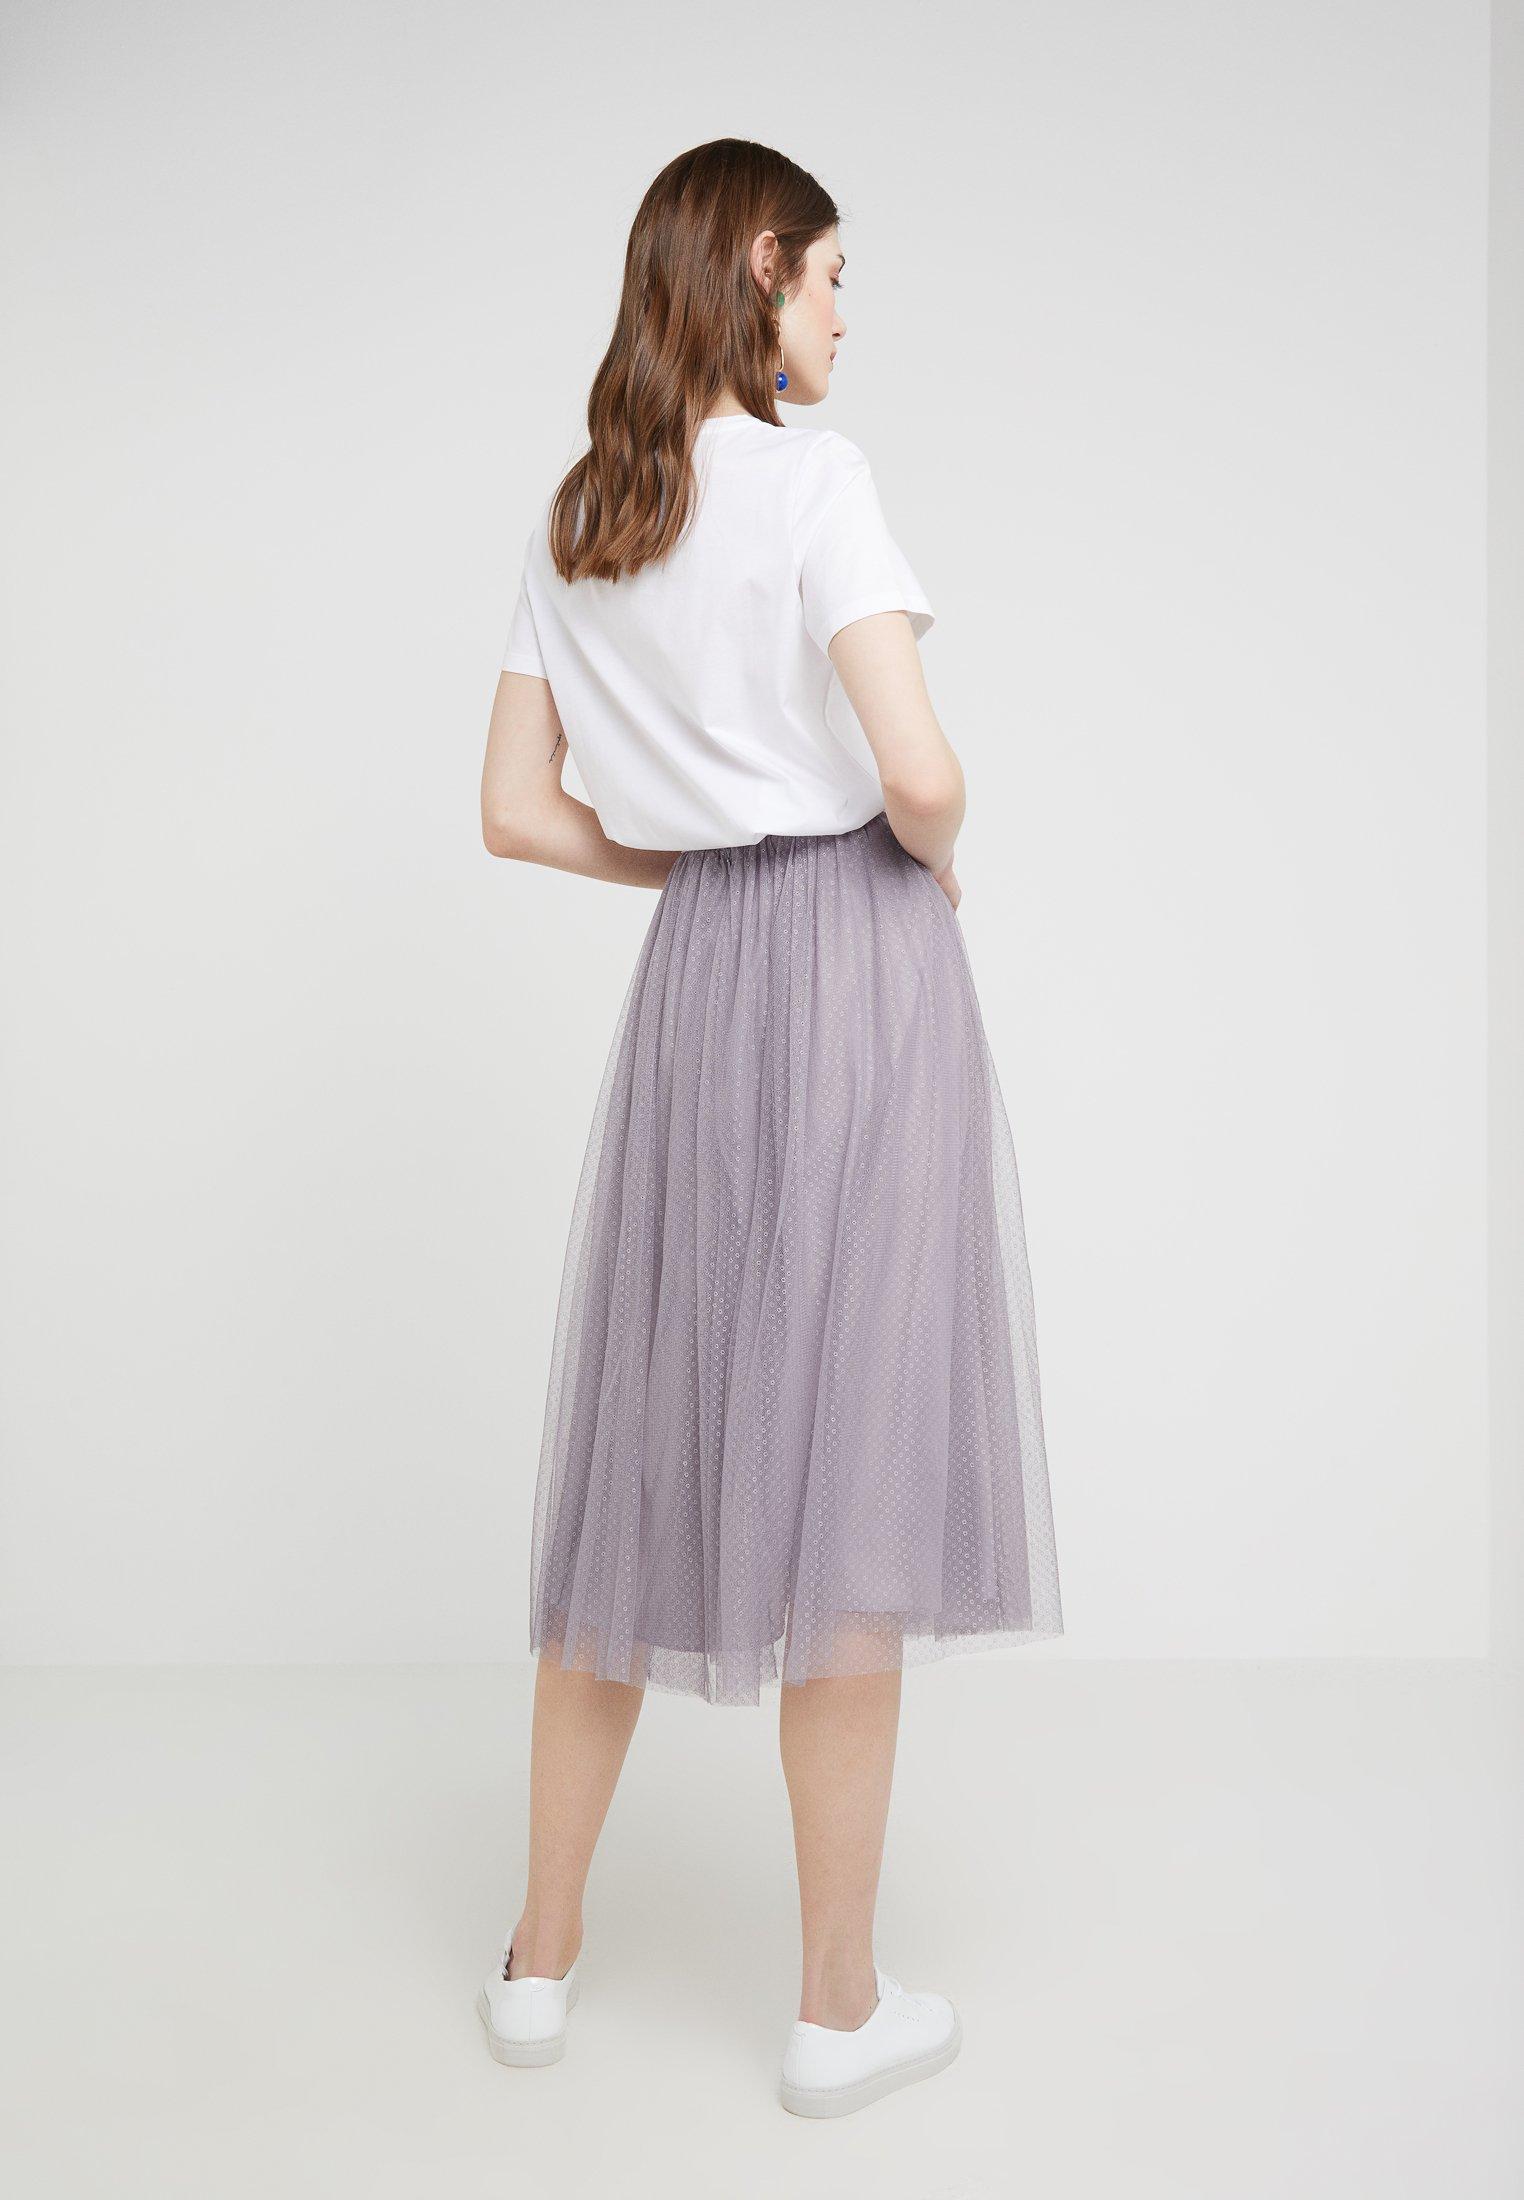 Needleamp; Trapèze Vintage SkirtJupe Thread Dotted Lavender WE2D9HI